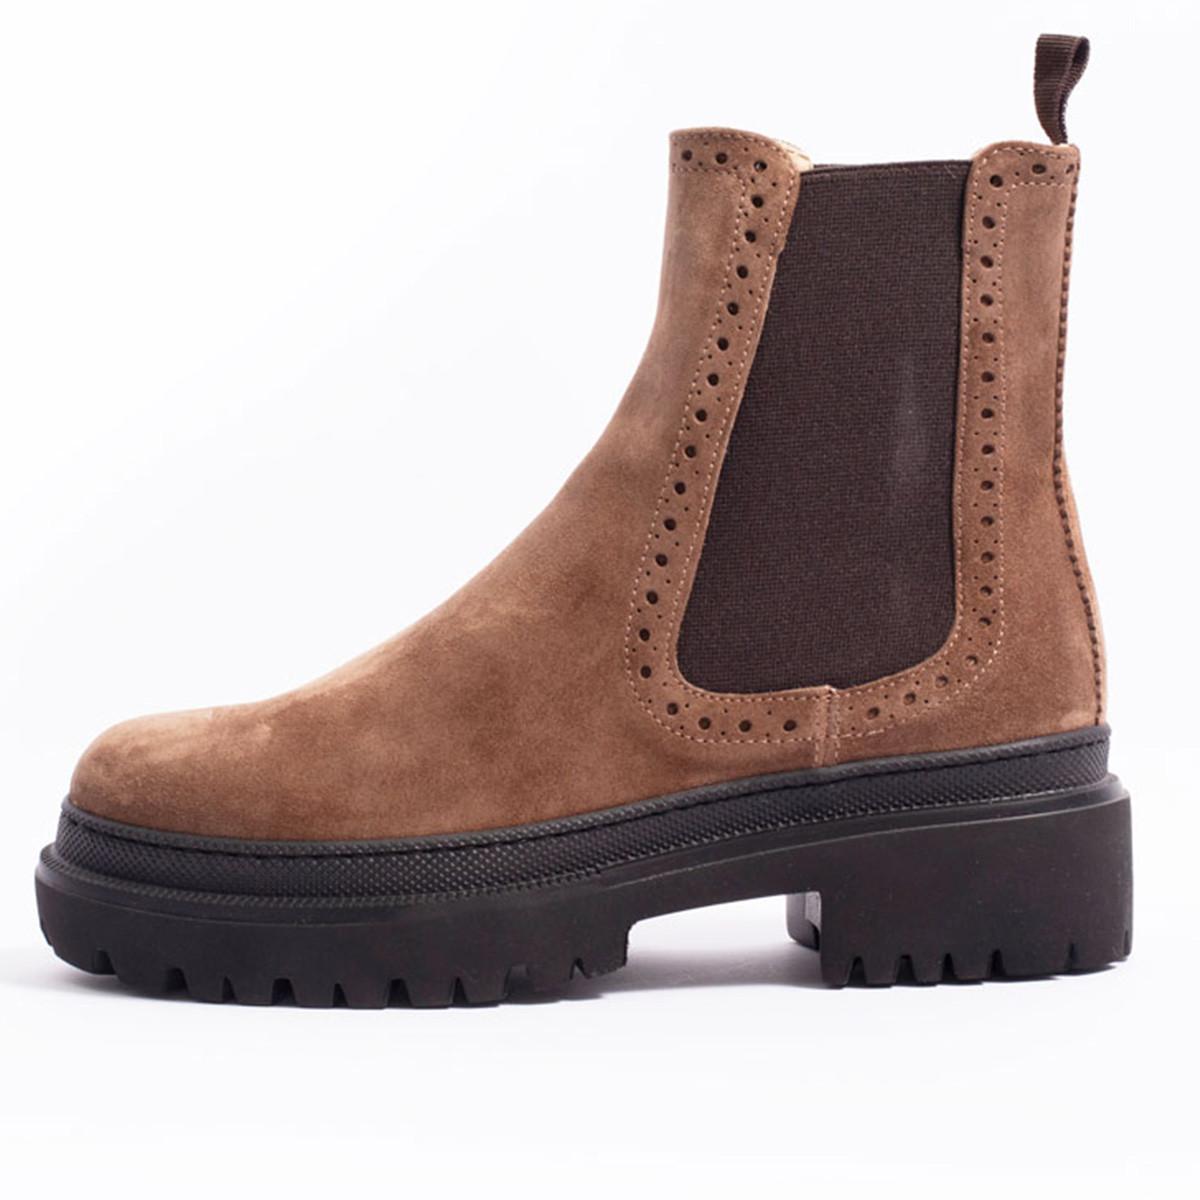 Boots en velours camel